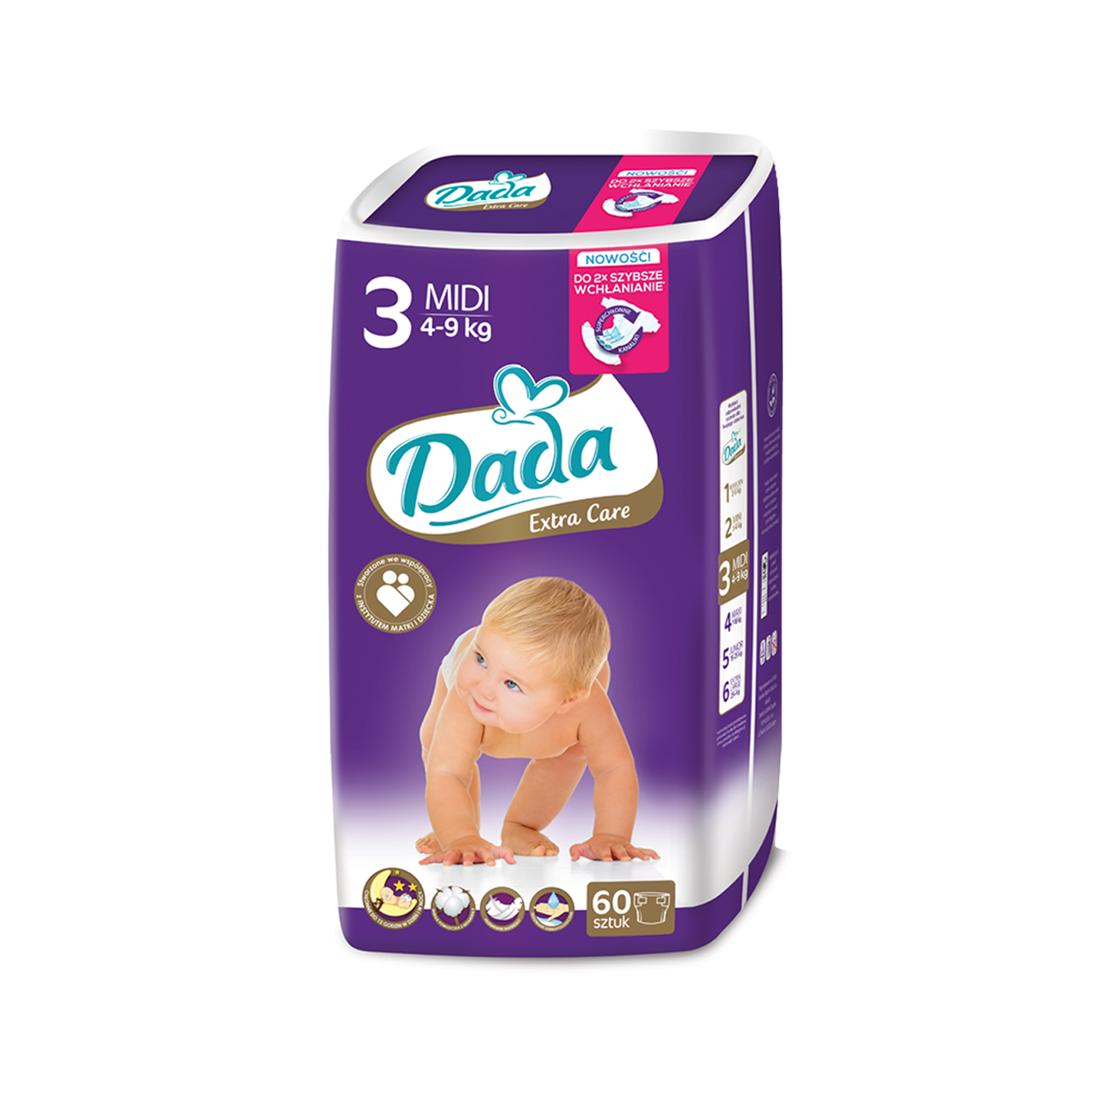 Подгузники Dada Extra Care Midi 3 (4-9кг), 60шт